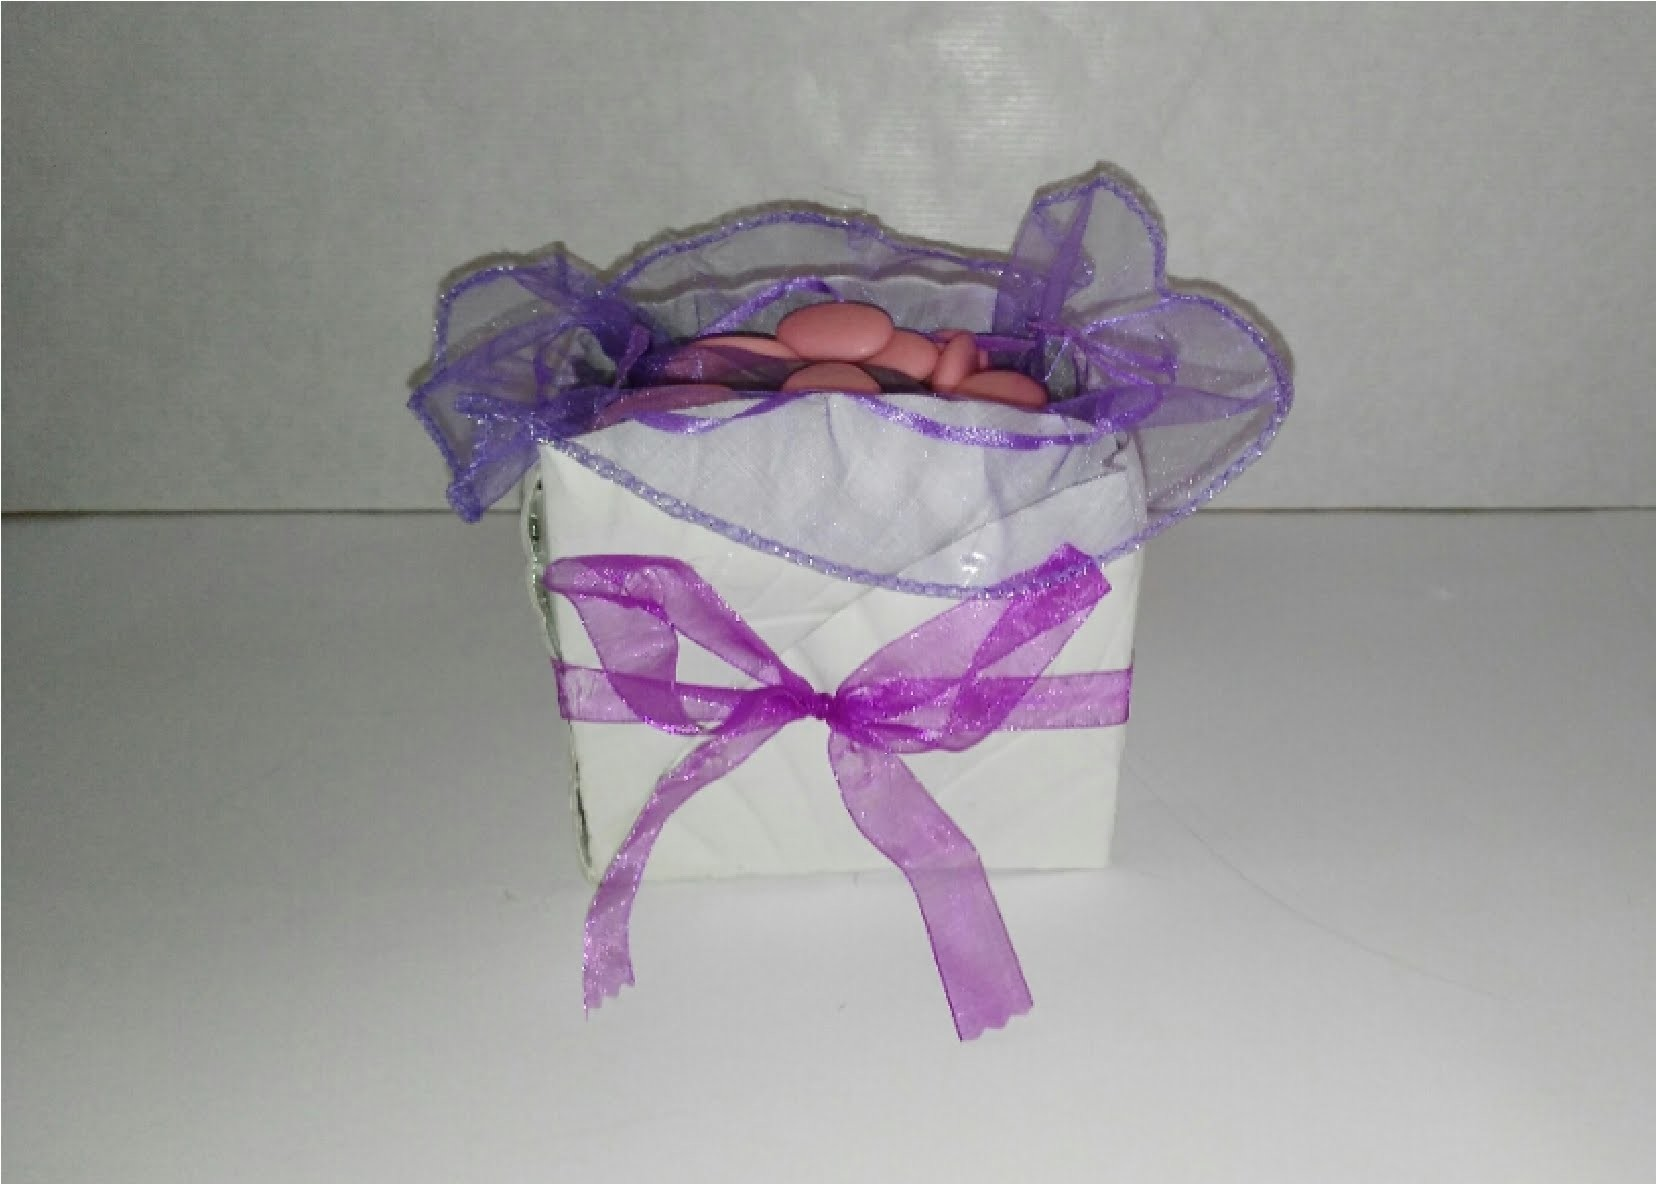 Como hacer caja con plato de carton desechable manualidades tutorial DIY